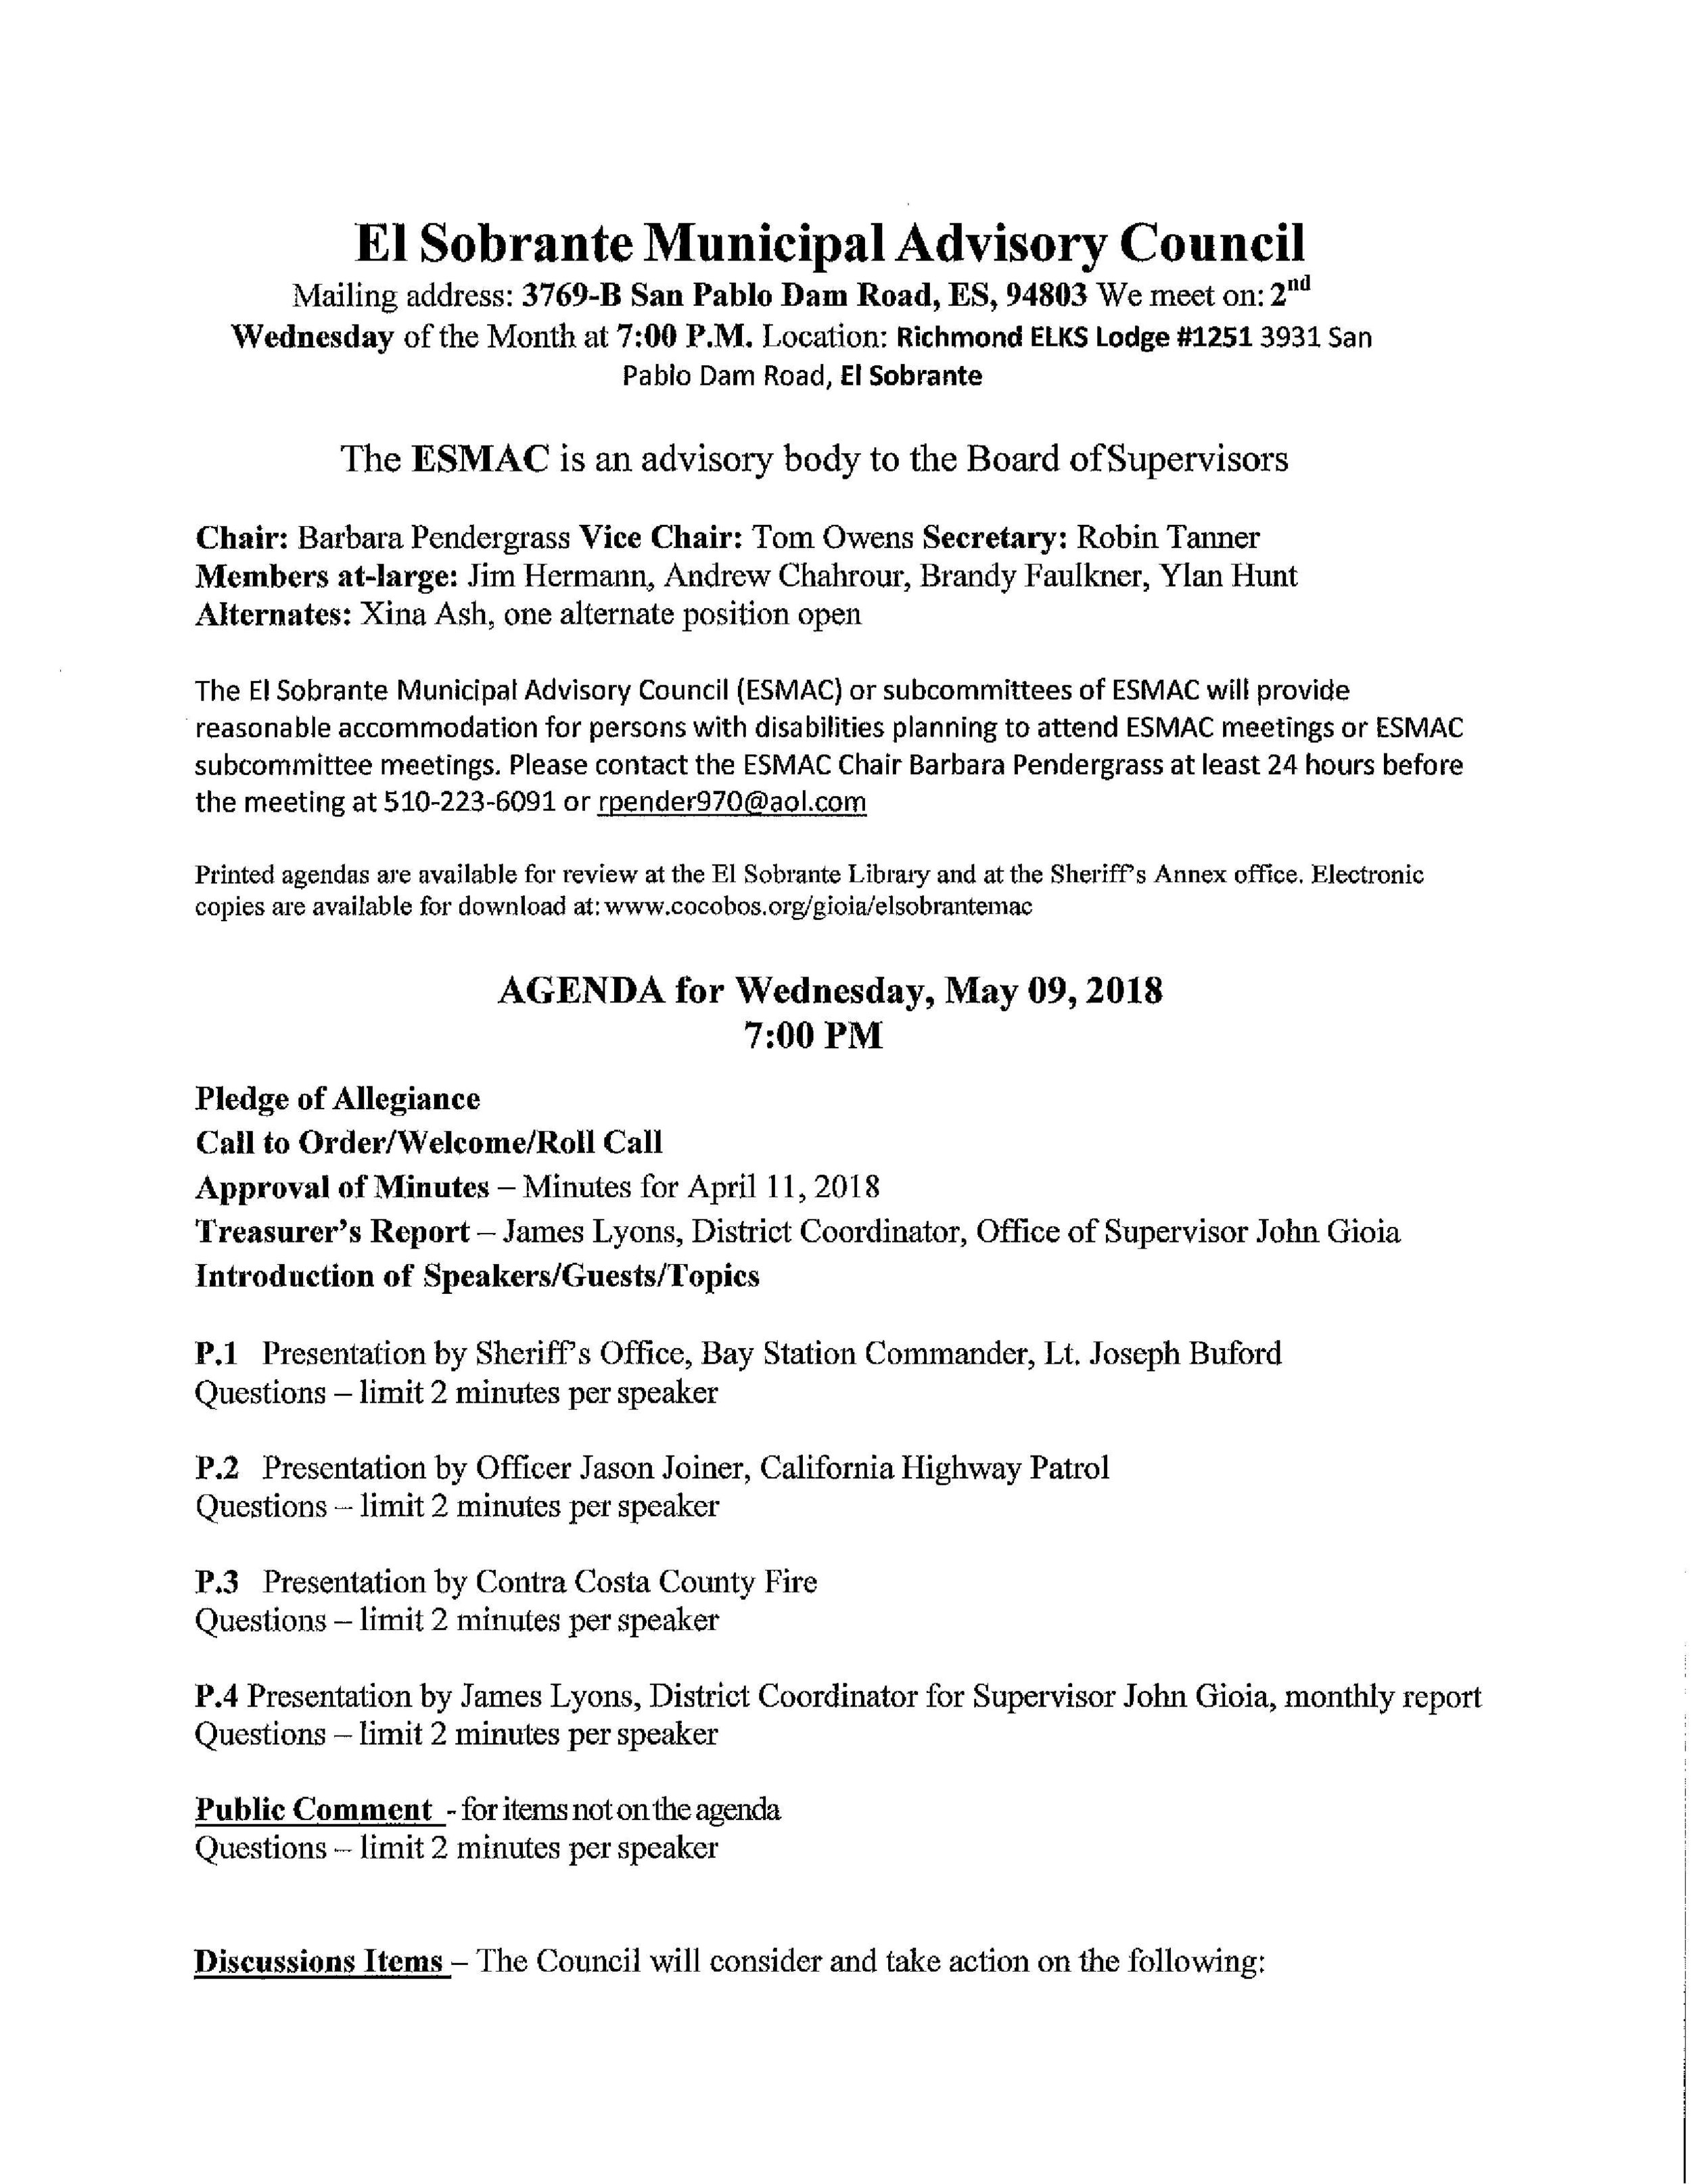 ESMAC Agenda 5.09.2018 (12 Pages)_1.jpg